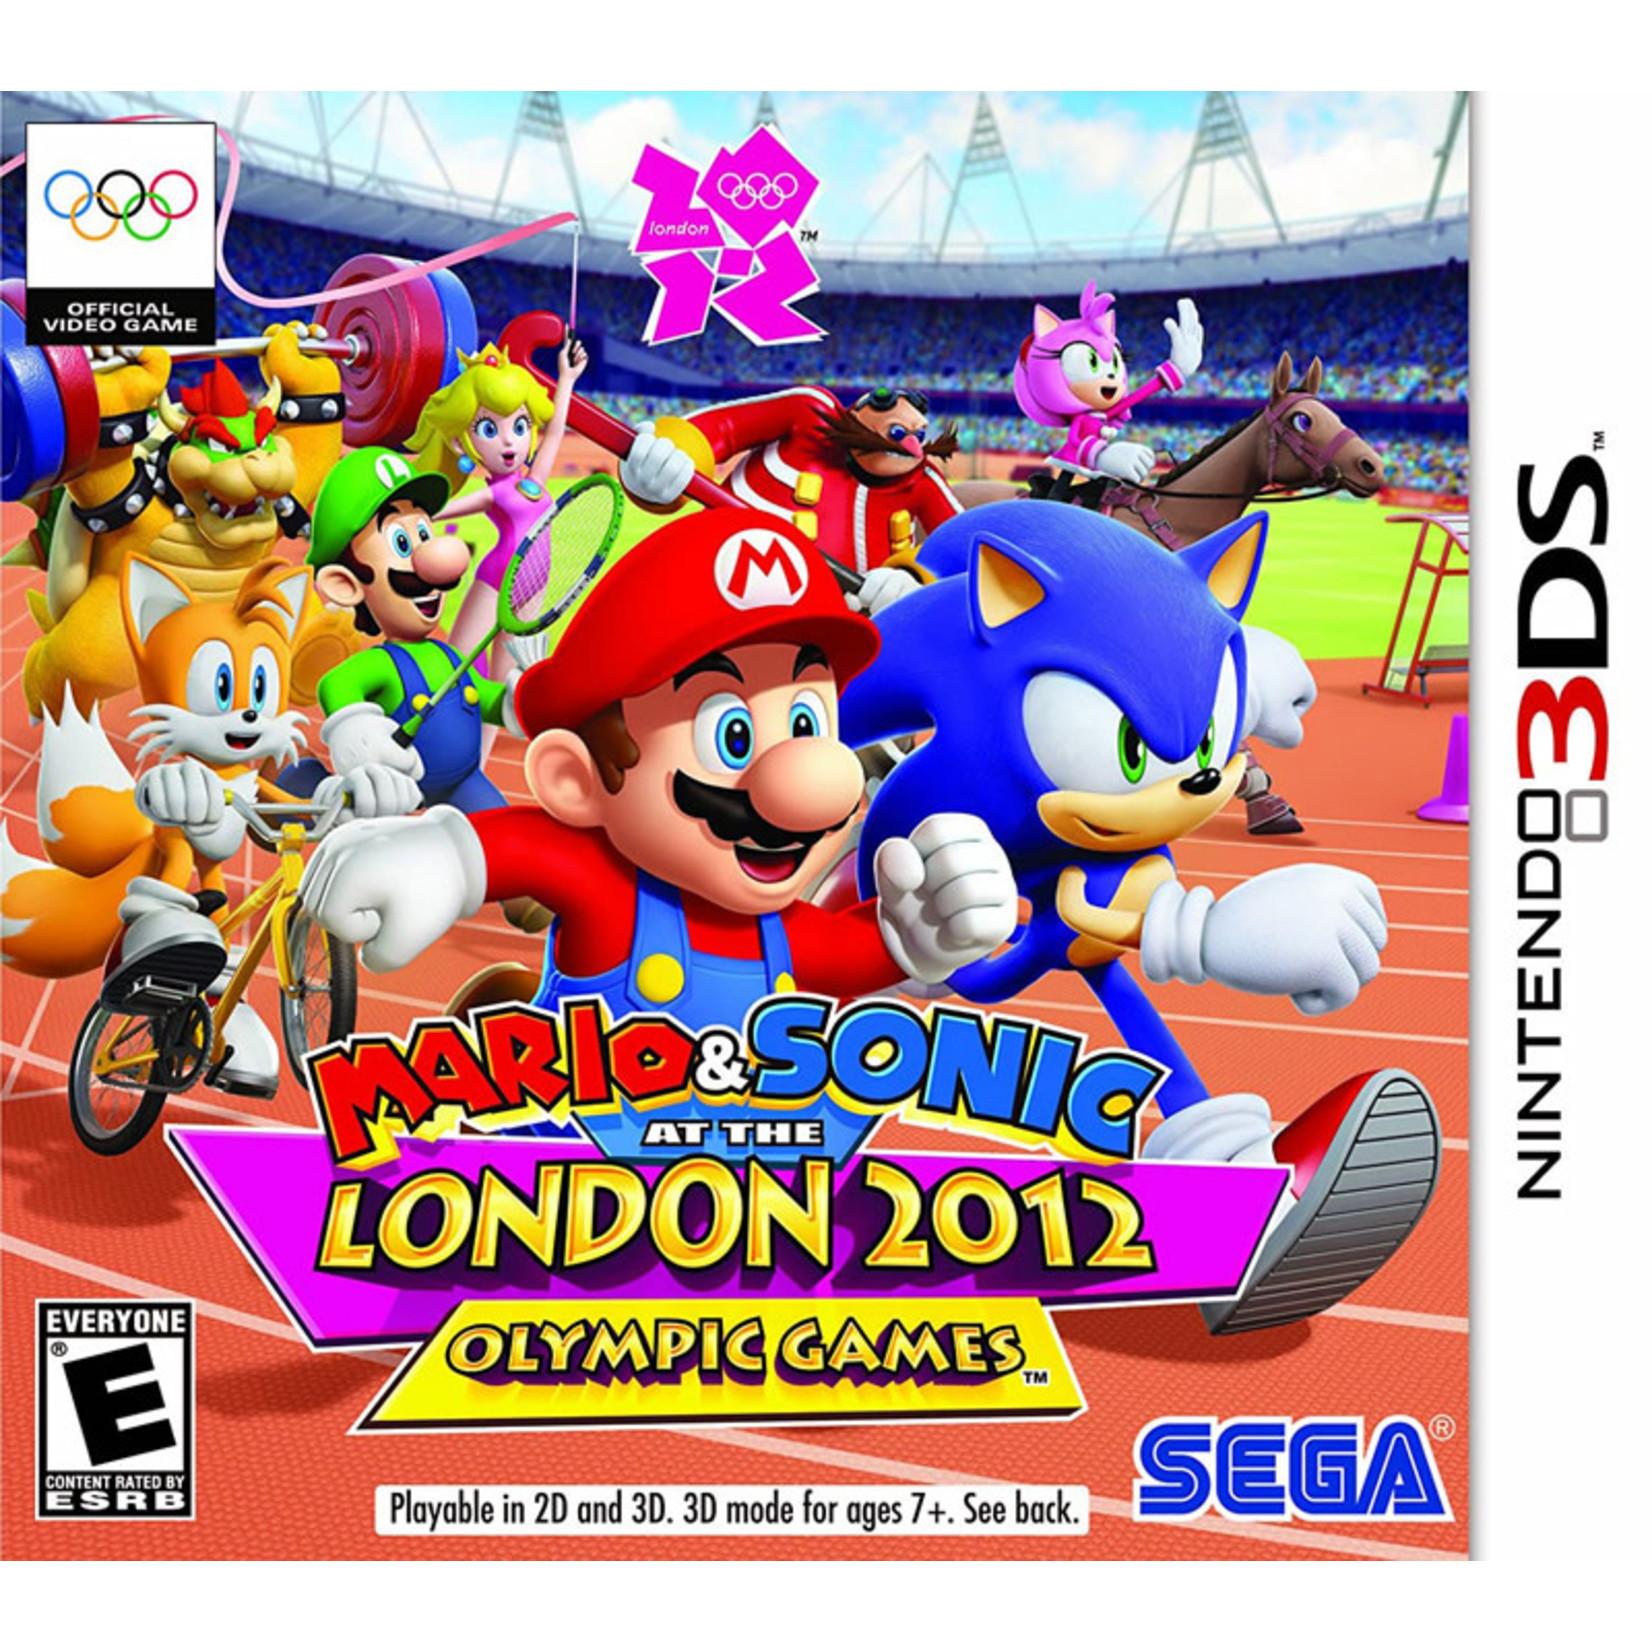 3dsu-Mario and Sonic: London Olympic Games